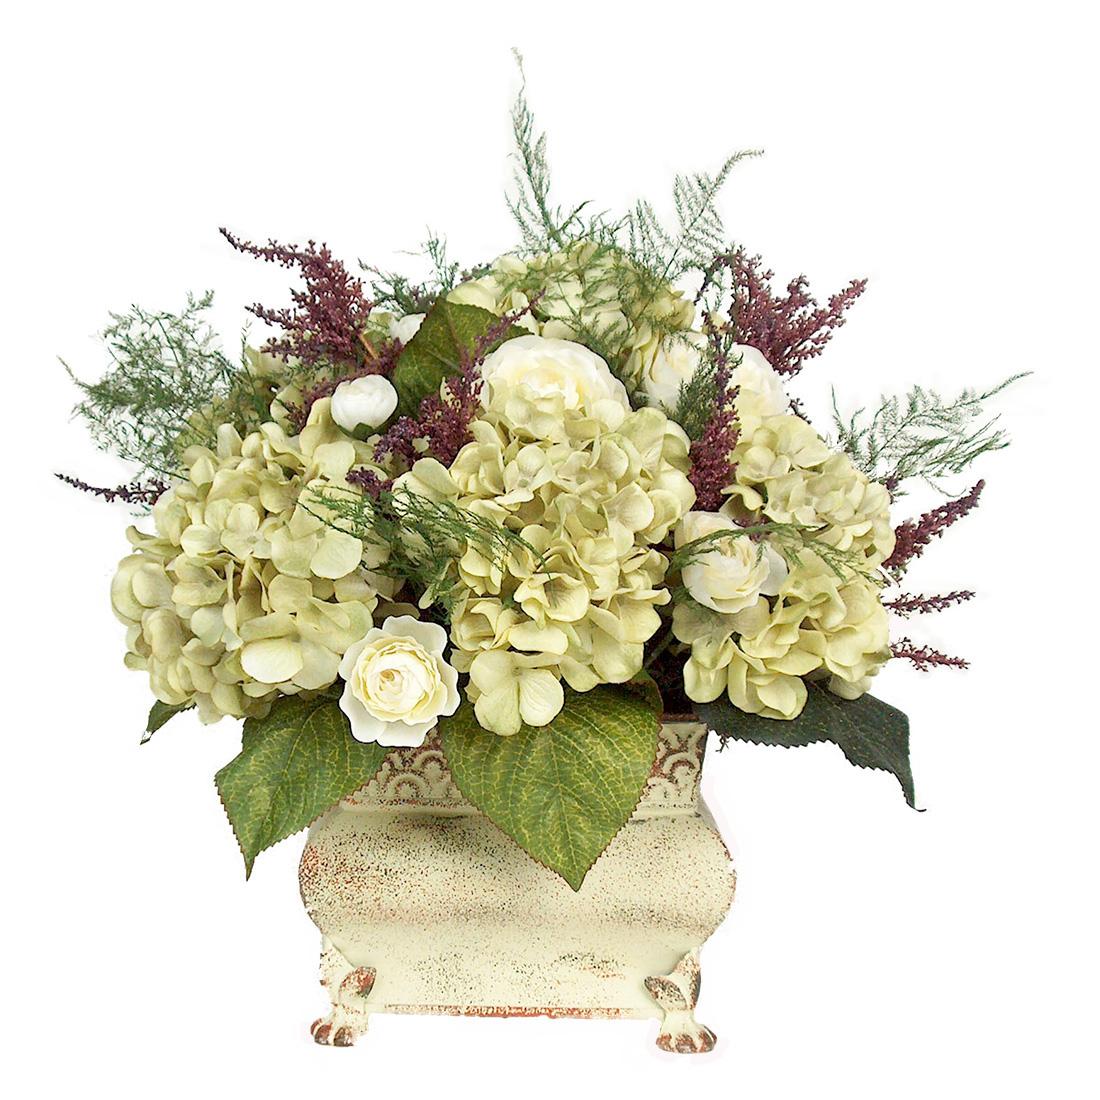 Hydrangea Arrangements: Celadon Hydrangea Floral Arrangement